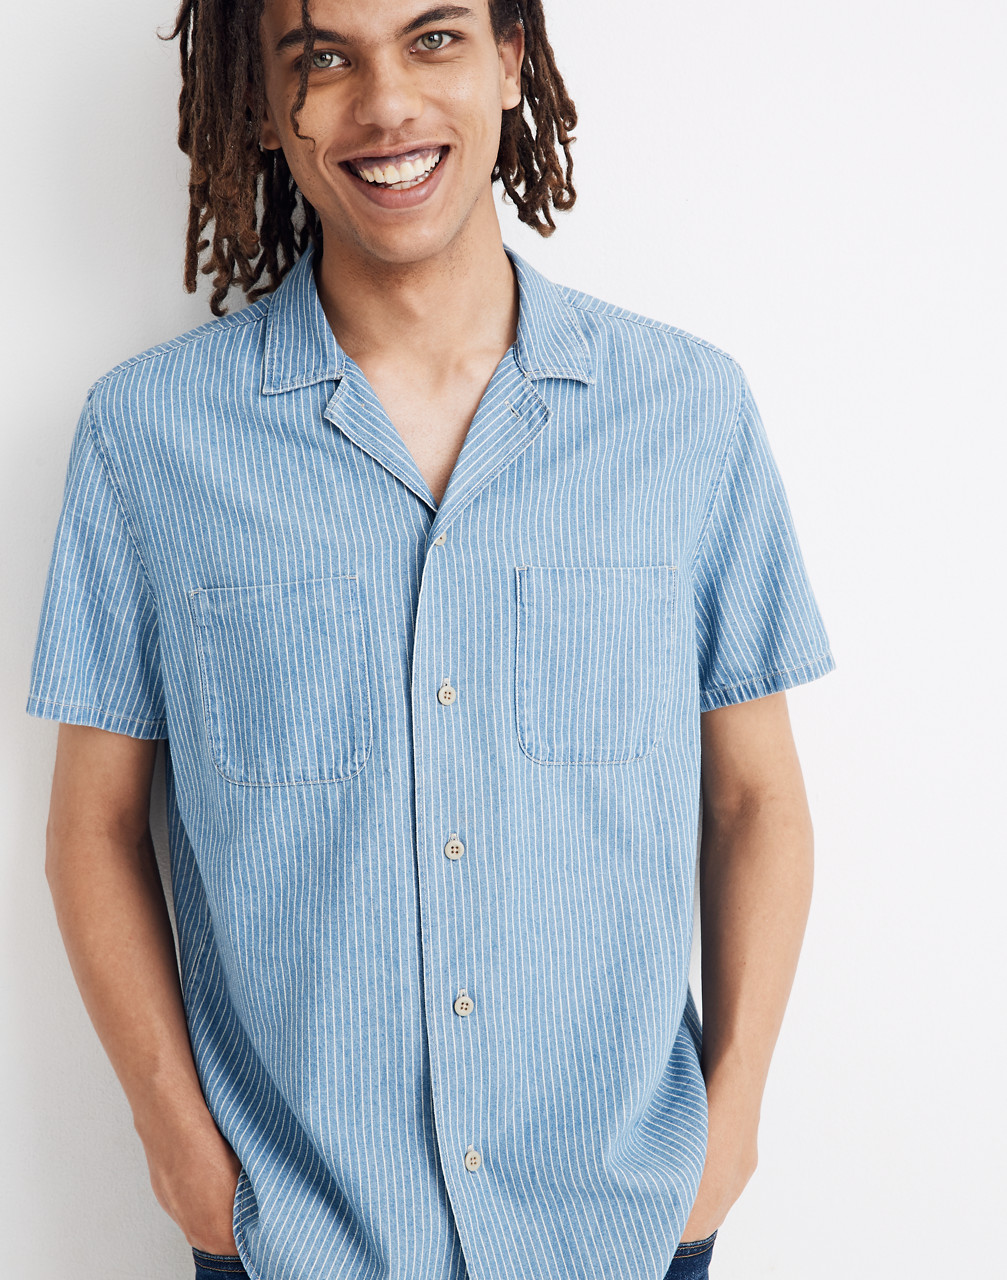 Men's Vintage Workwear – 1920s, 1930s, 1940s, 1950s Easy Camp Shirt in Indigo Railroad Stripe $79.50 AT vintagedancer.com